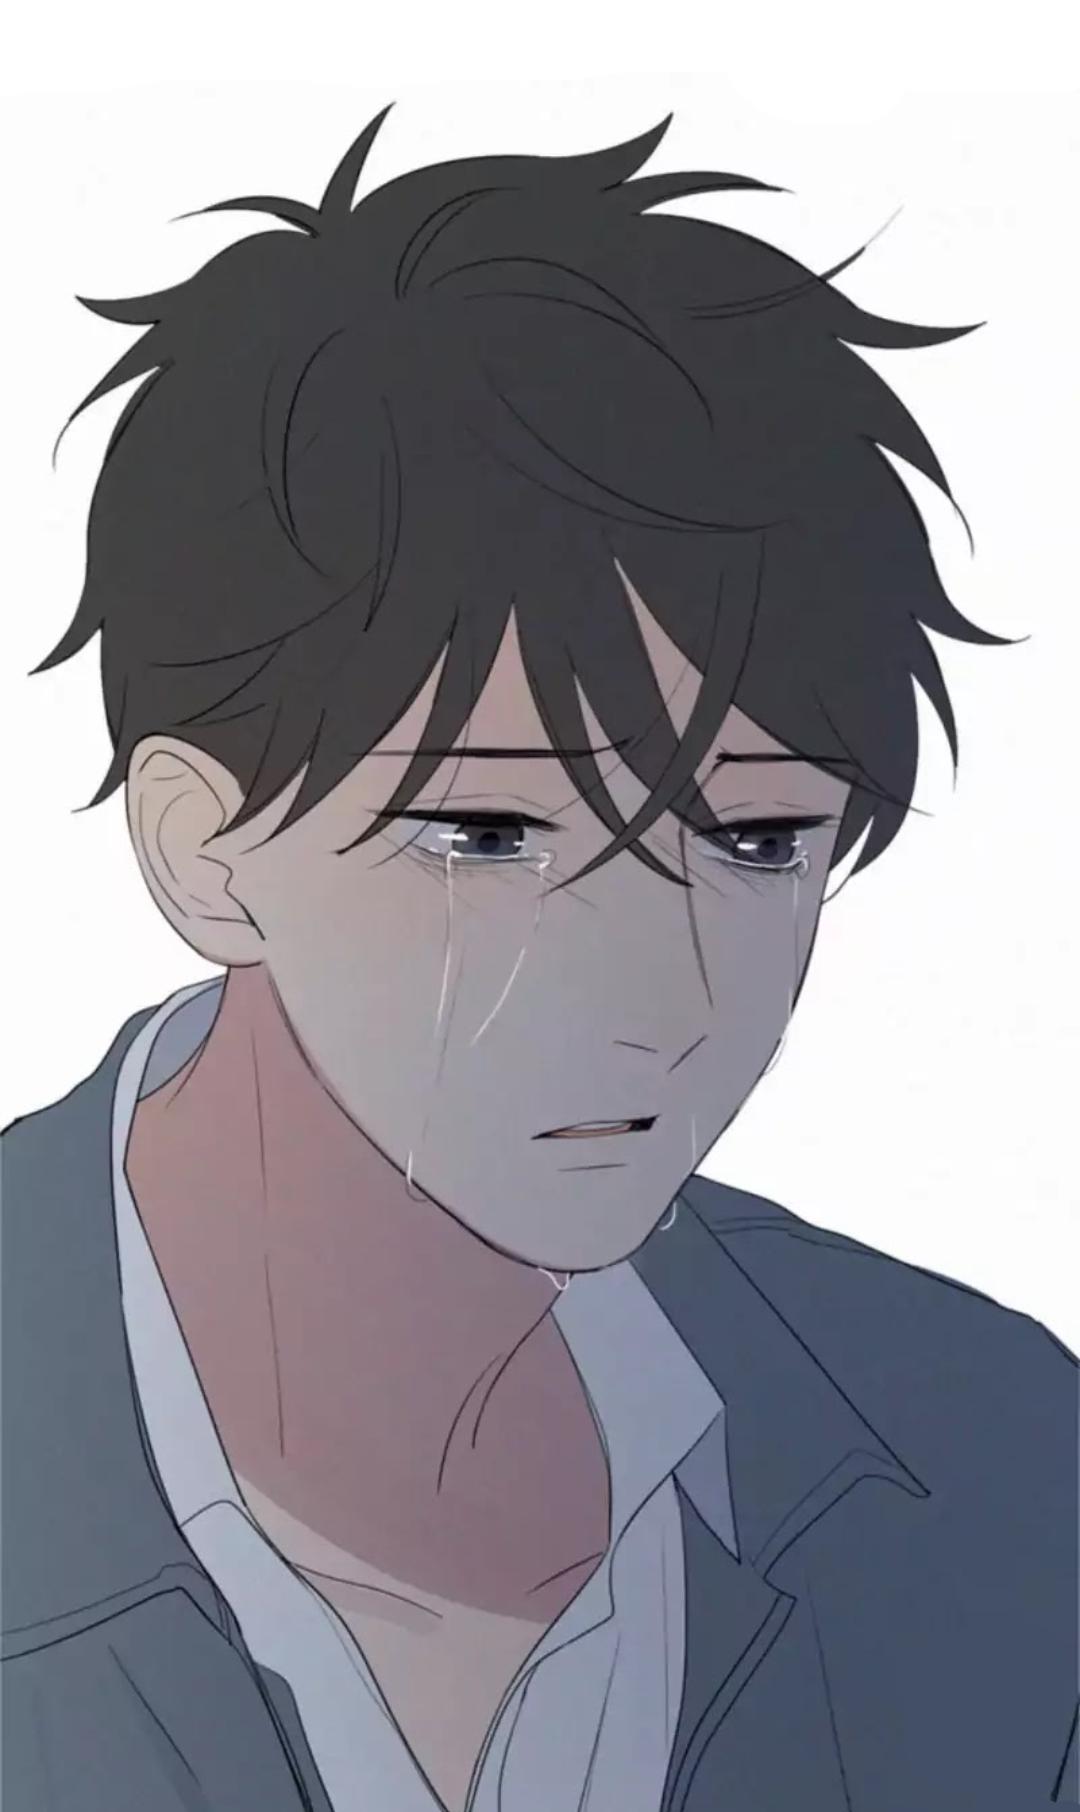 Pin by Megan on Anime Guys Anime crying, Anime boy